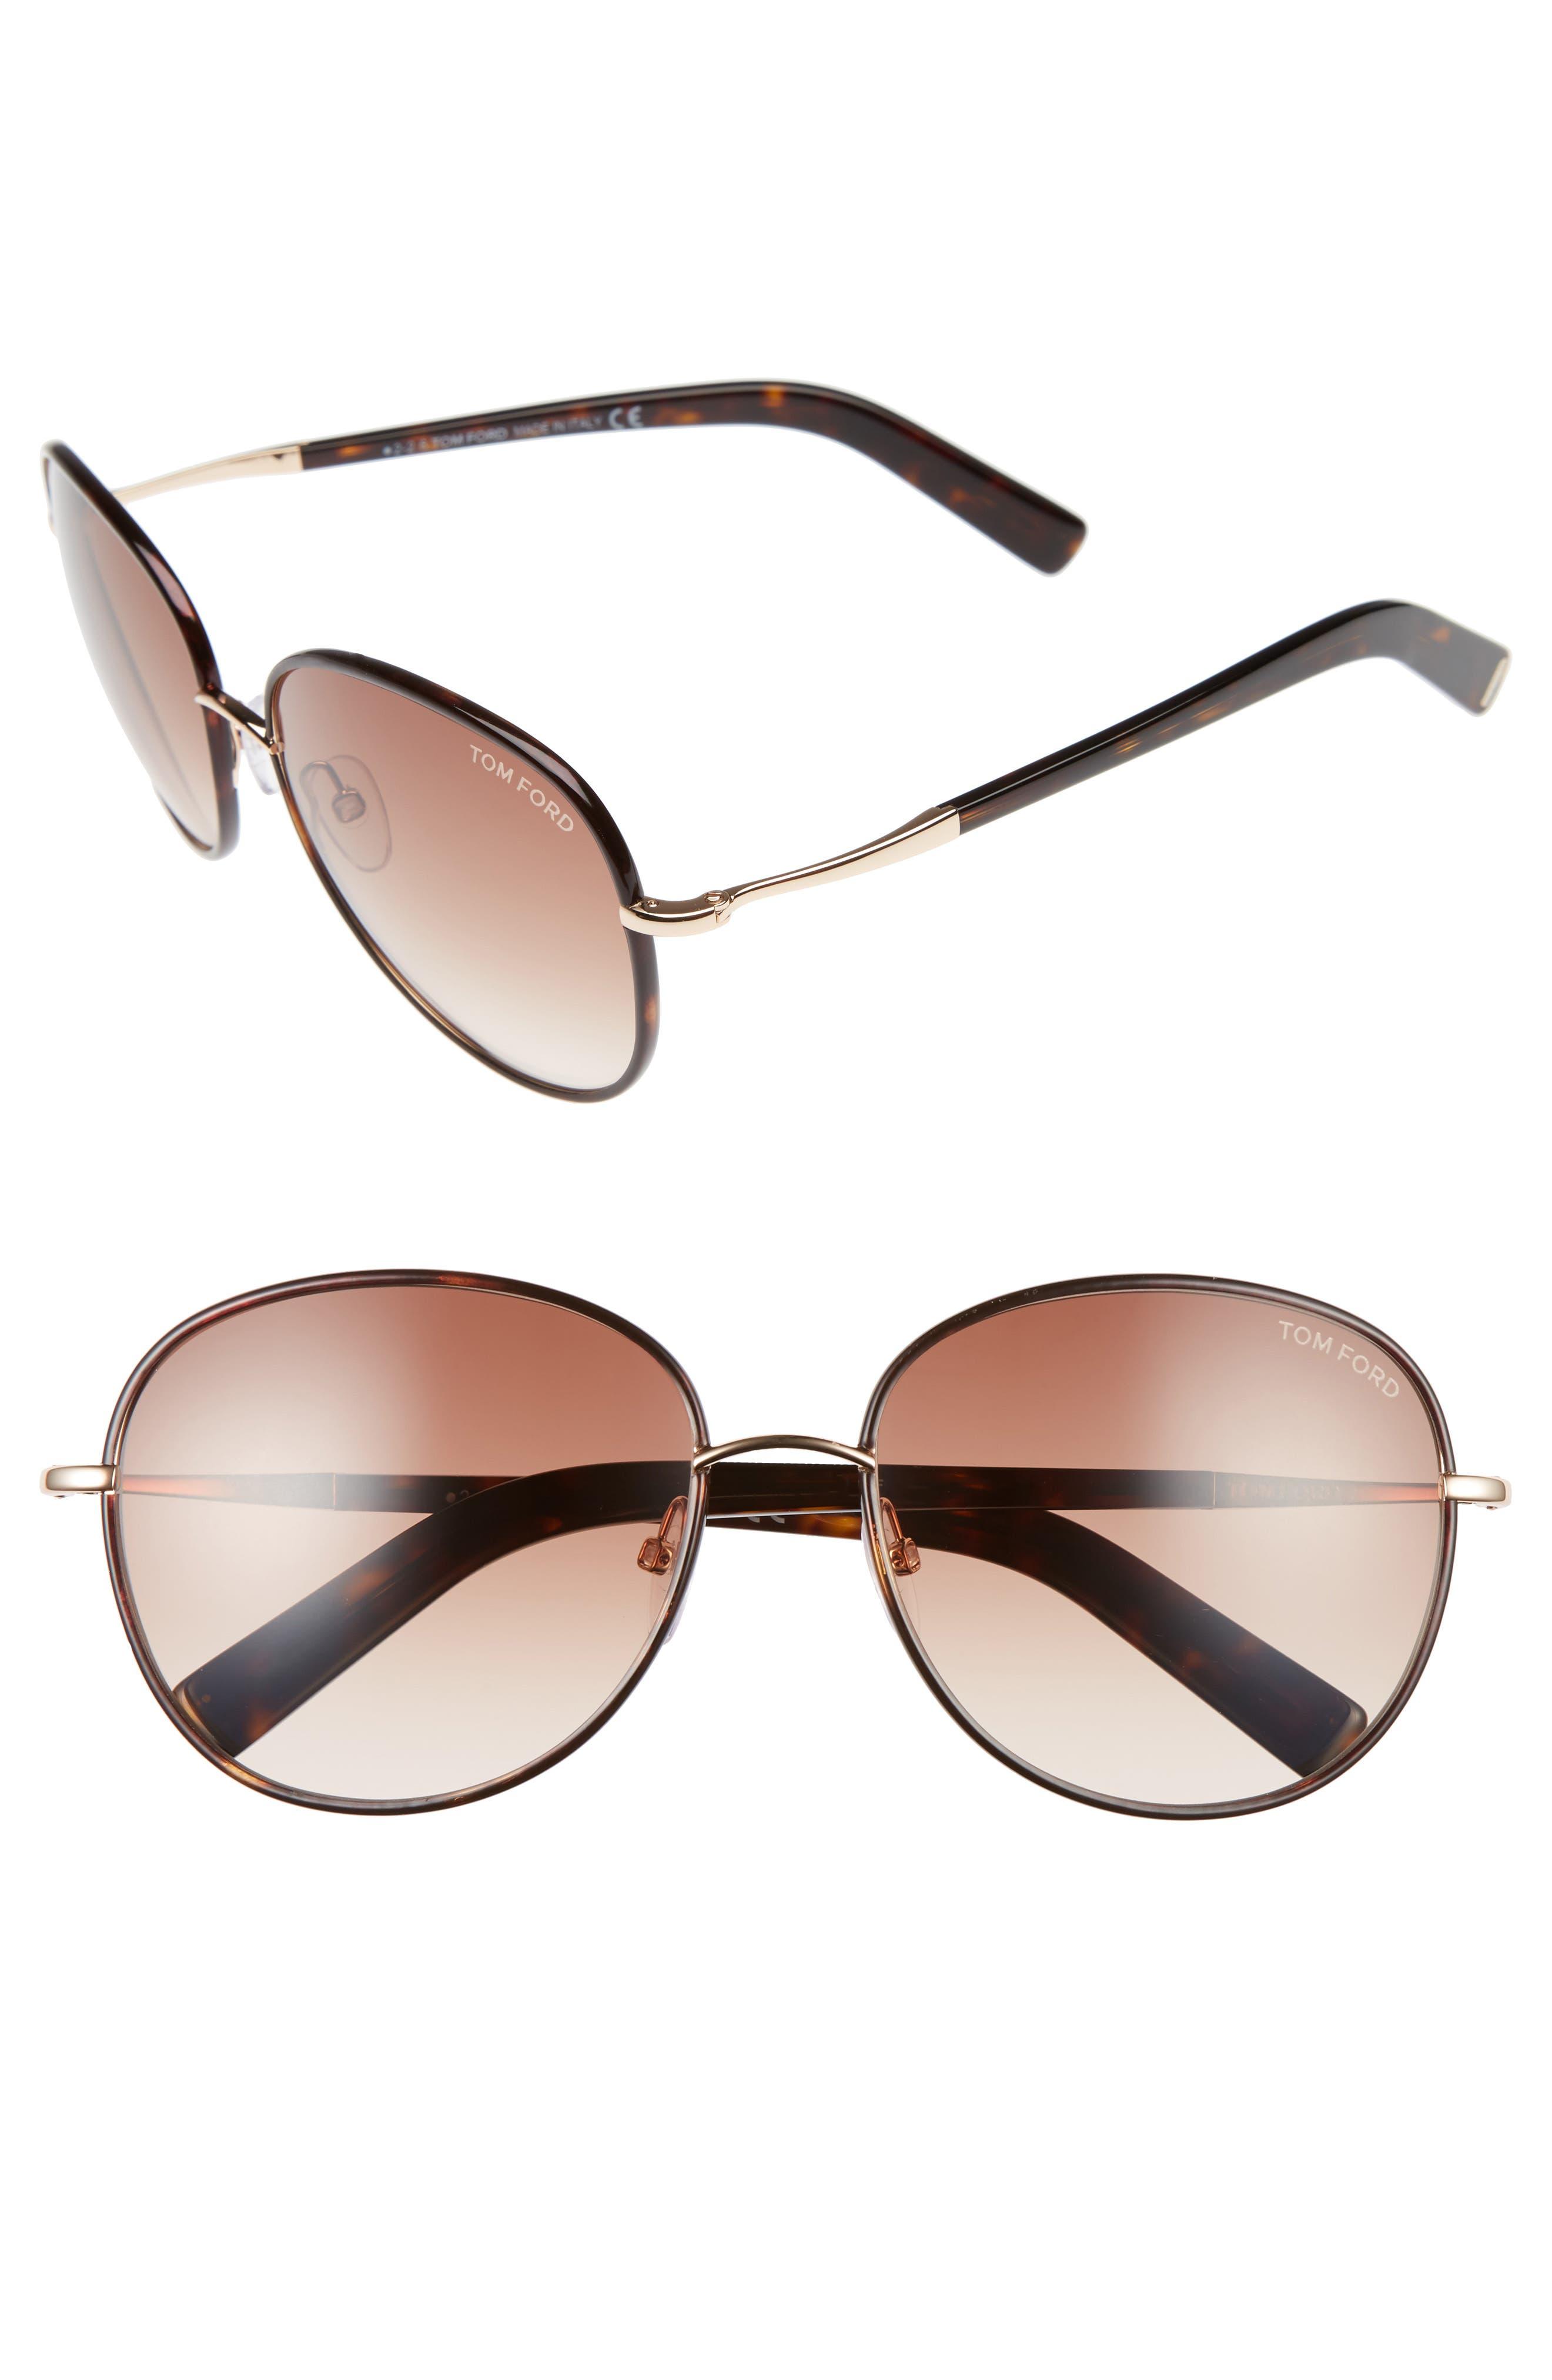 Tom Ford Georgia 5m Sunglasses -